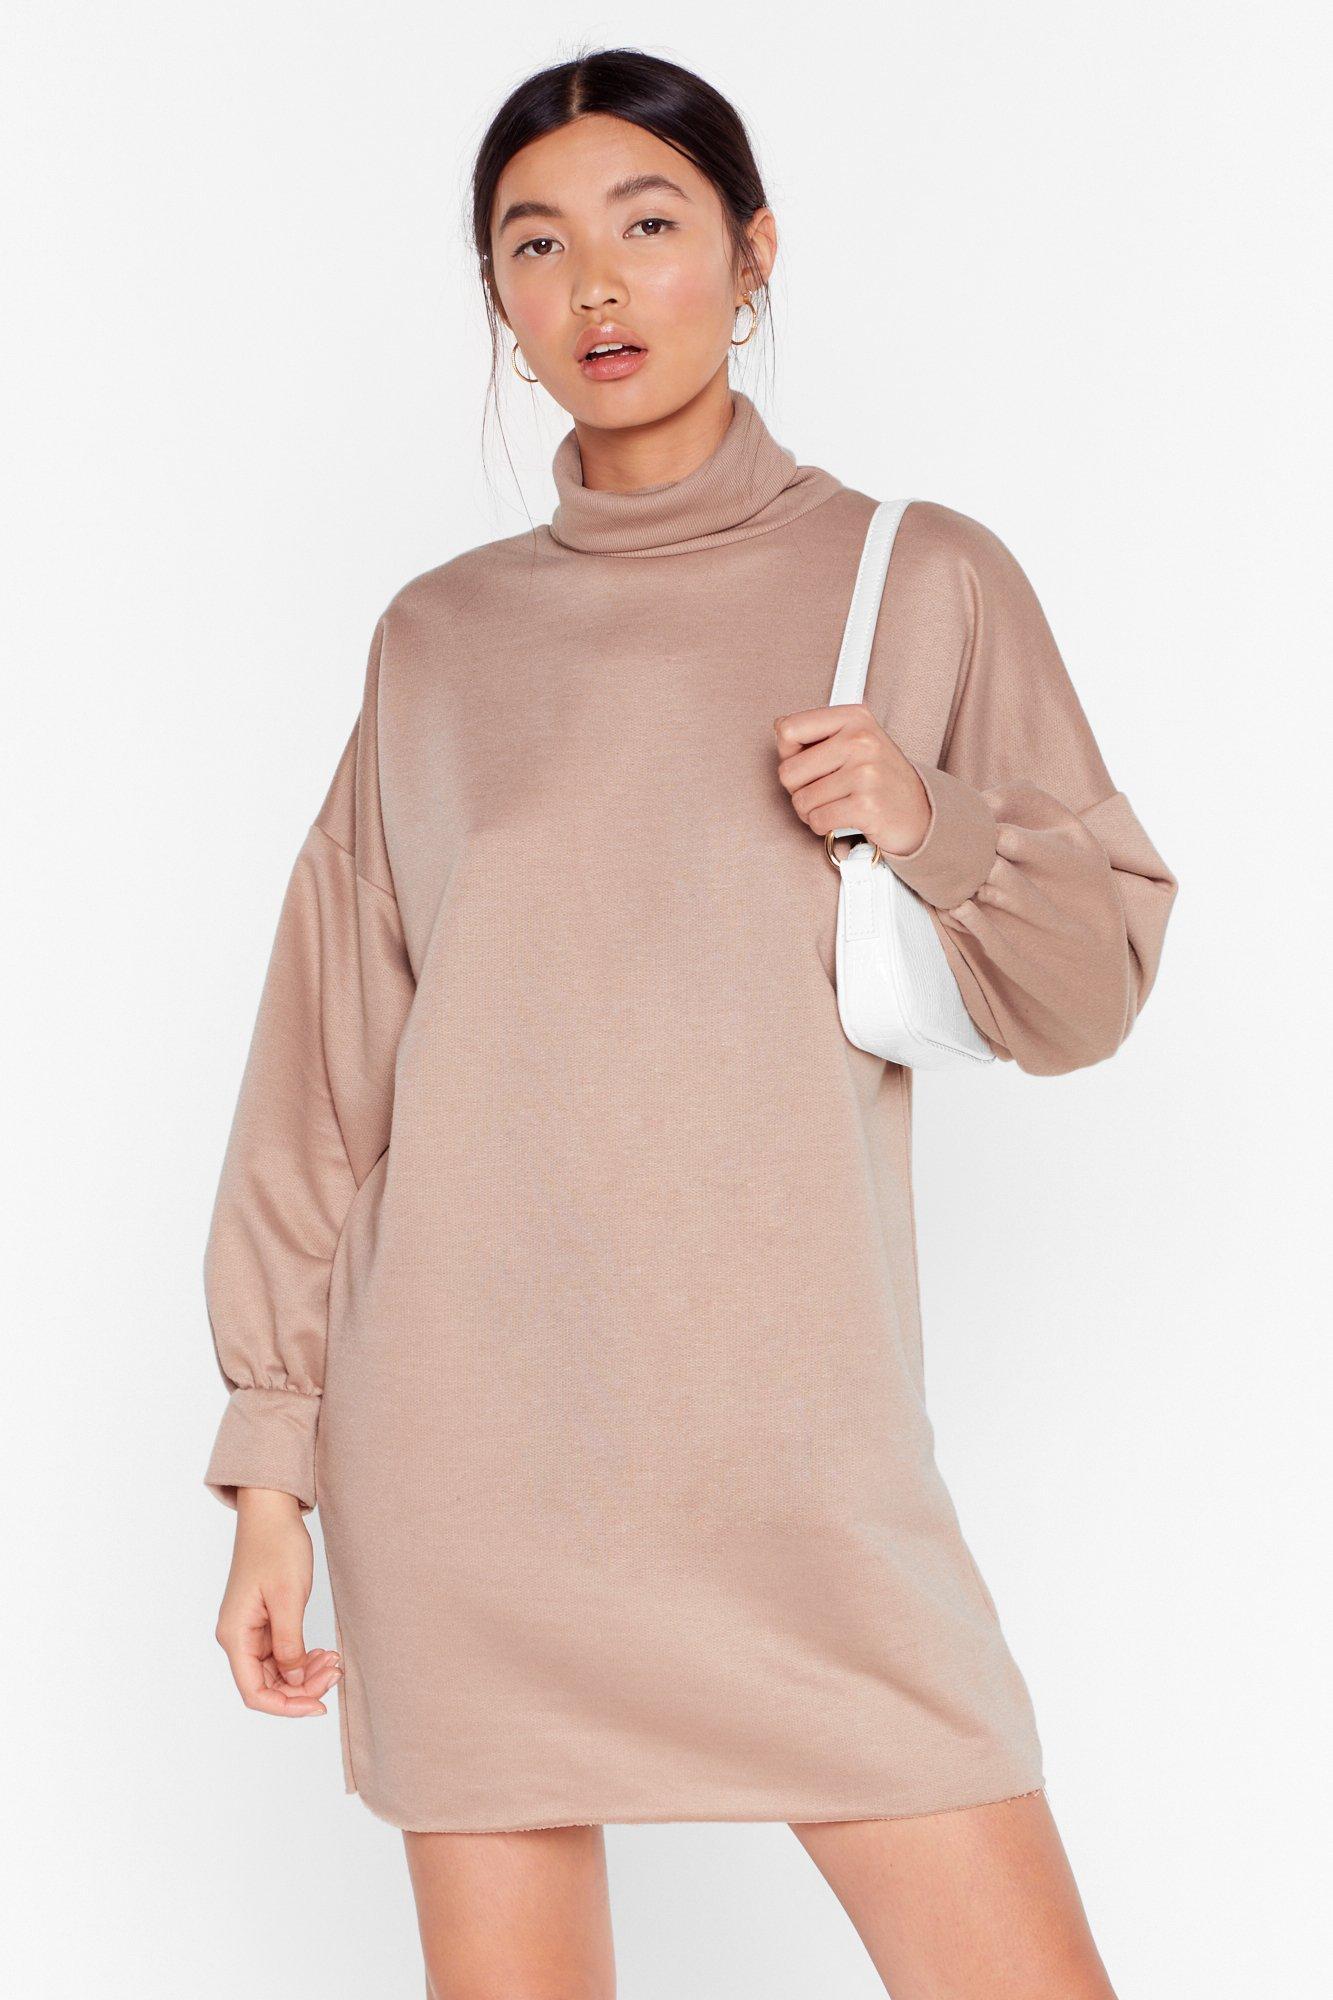 Image of No Sweat Turtleneck Sweatshirt Dress